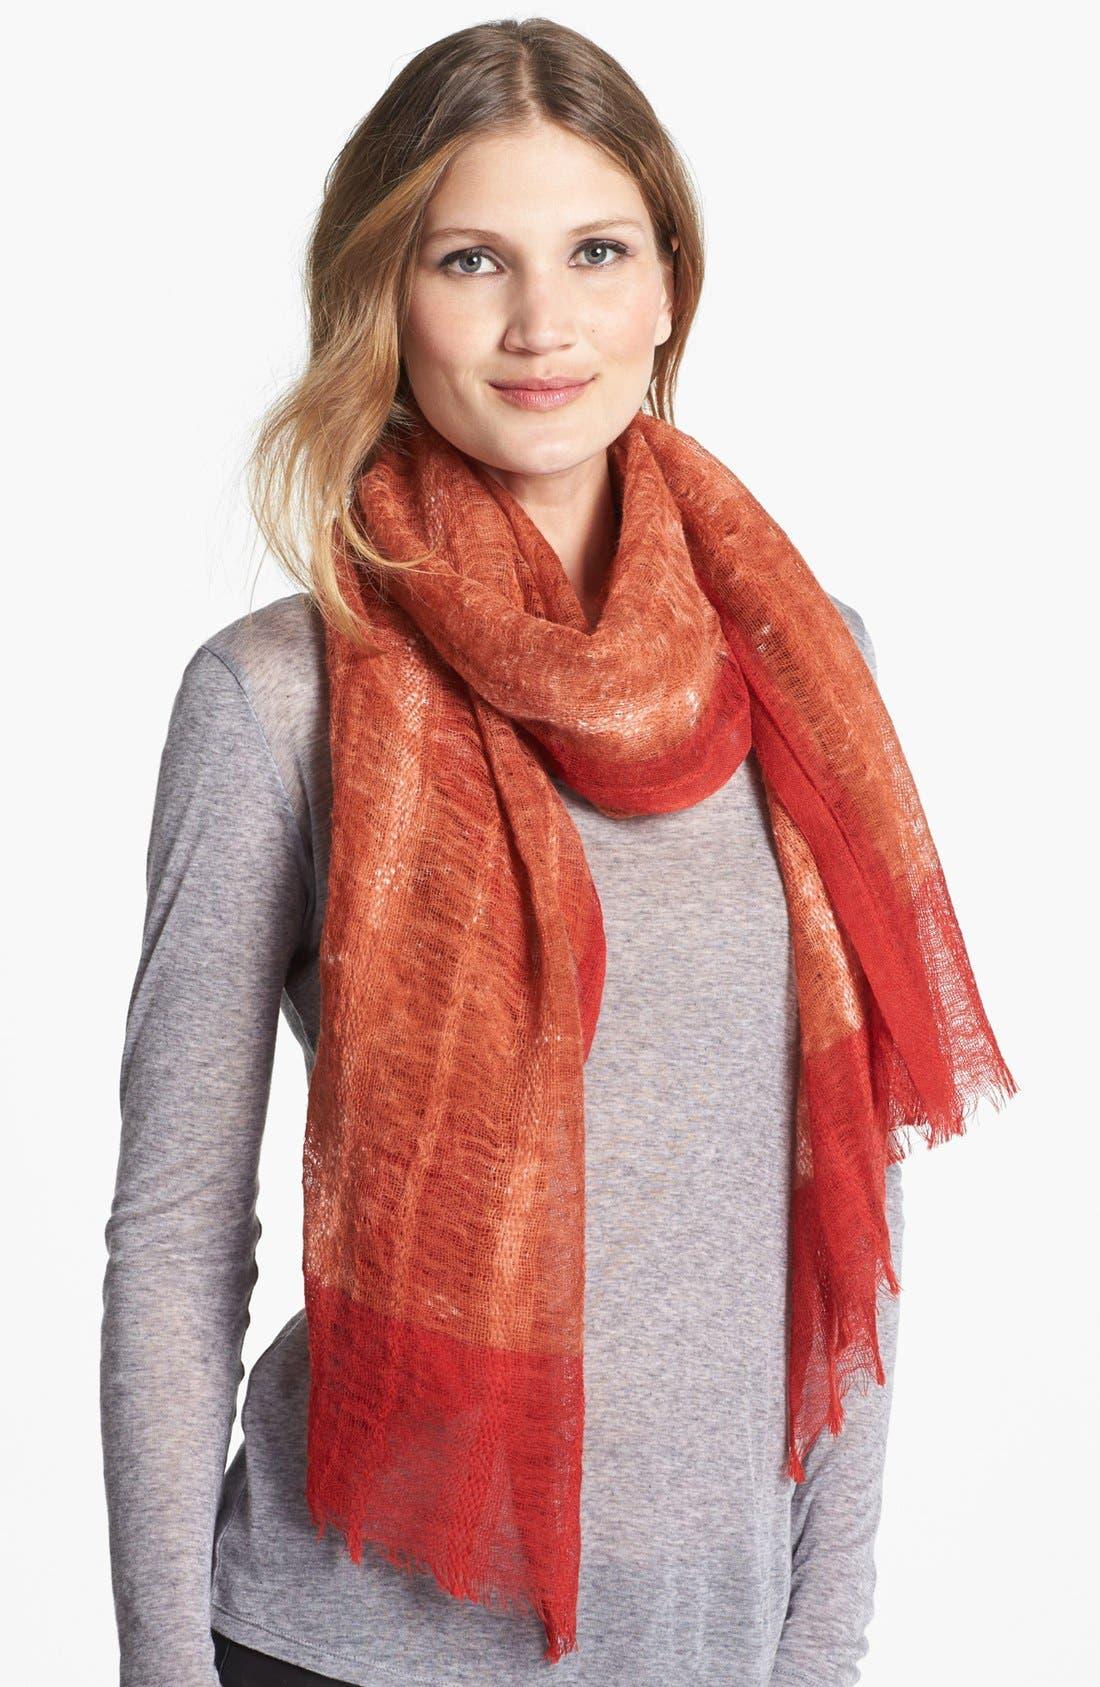 Alternate Image 1 Selected - Eileen Fisher Two-Tone Wool Scarf (Regular & Petite)